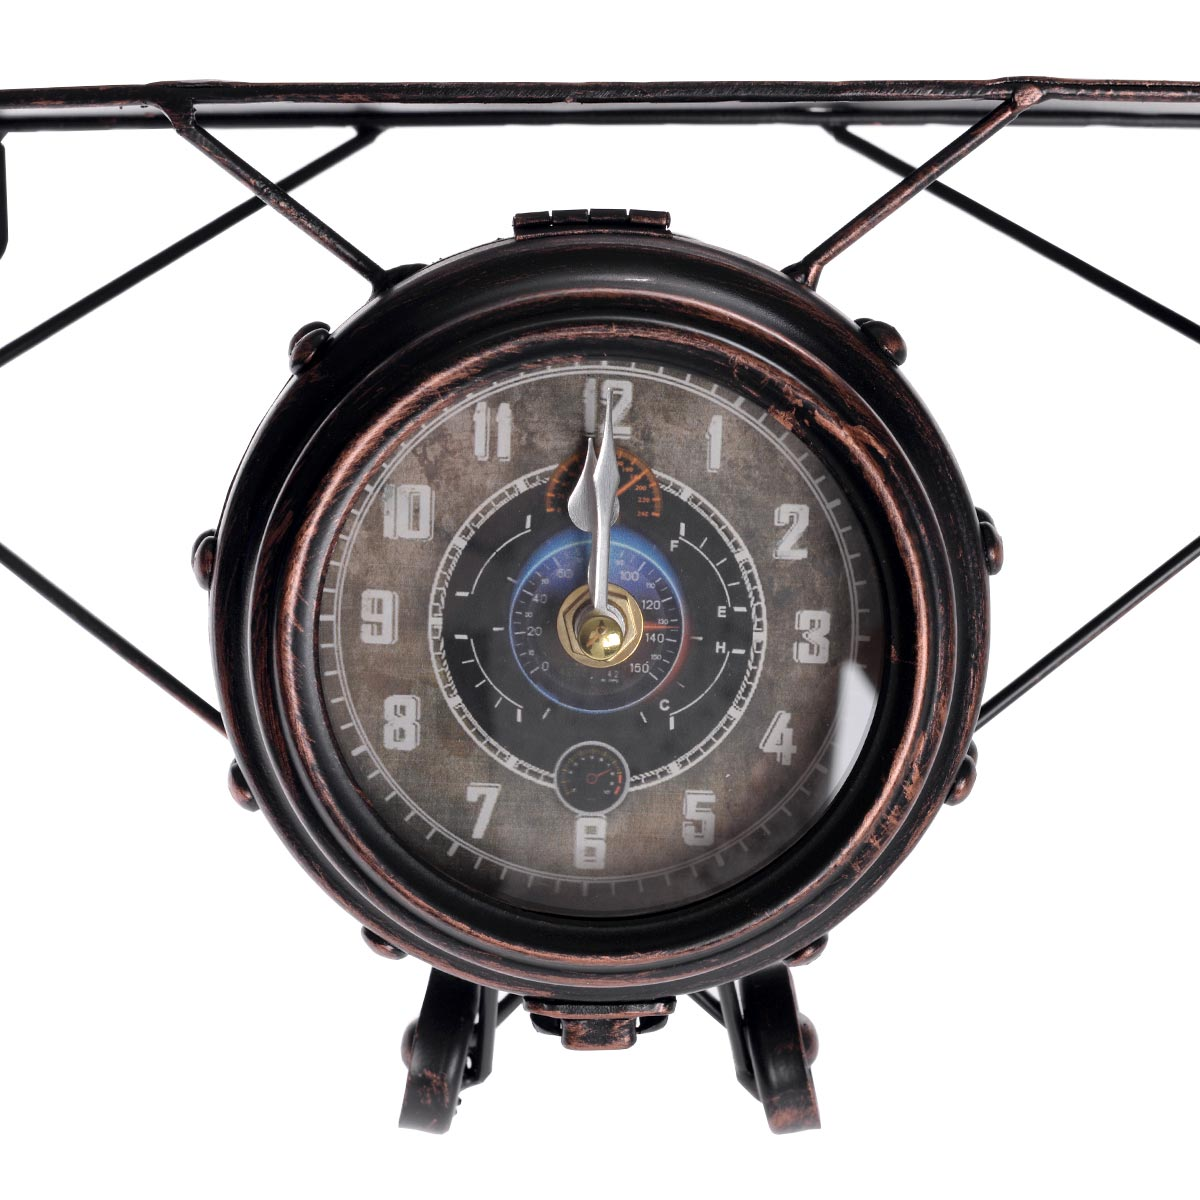 Vintage χειροποίητο διακοσμητικό ρολόι - αεροπλάνο μεταλλικό - ΟΕΜ 52317